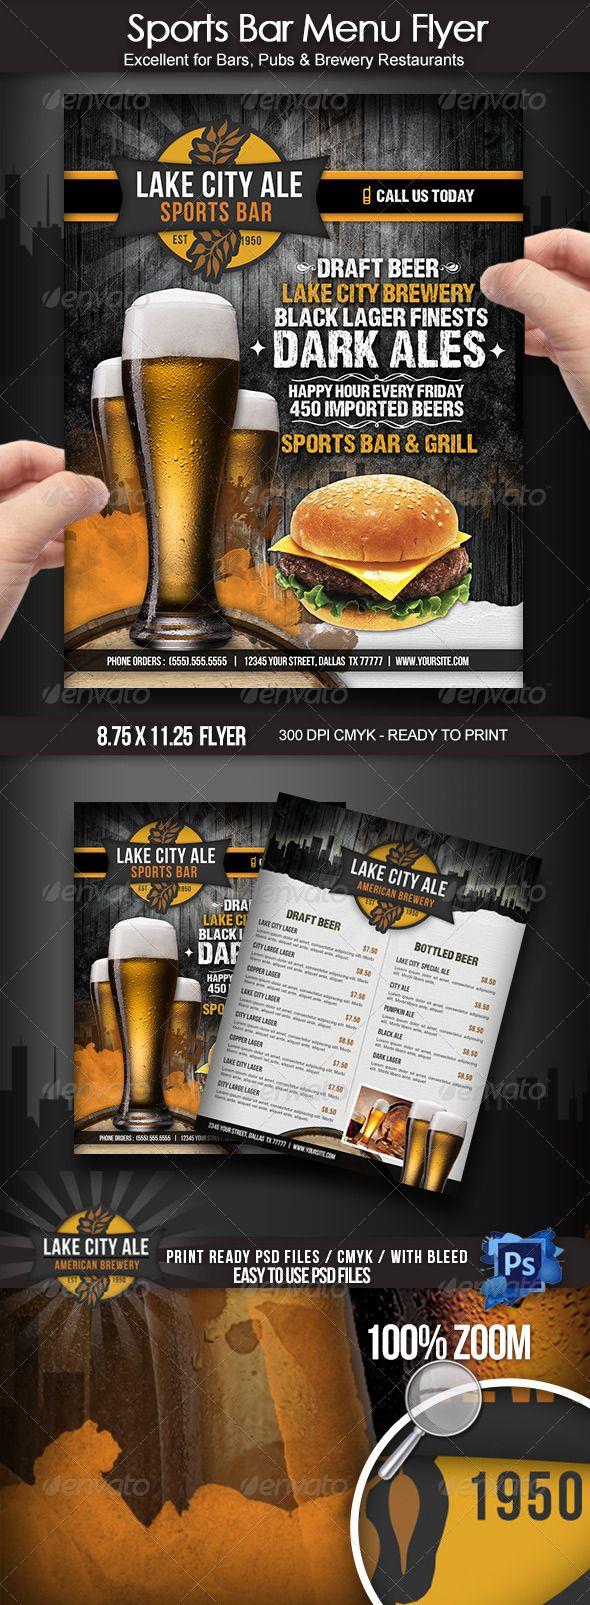 sports bar menu flyer - restaurant flyers   cranker   pinterest